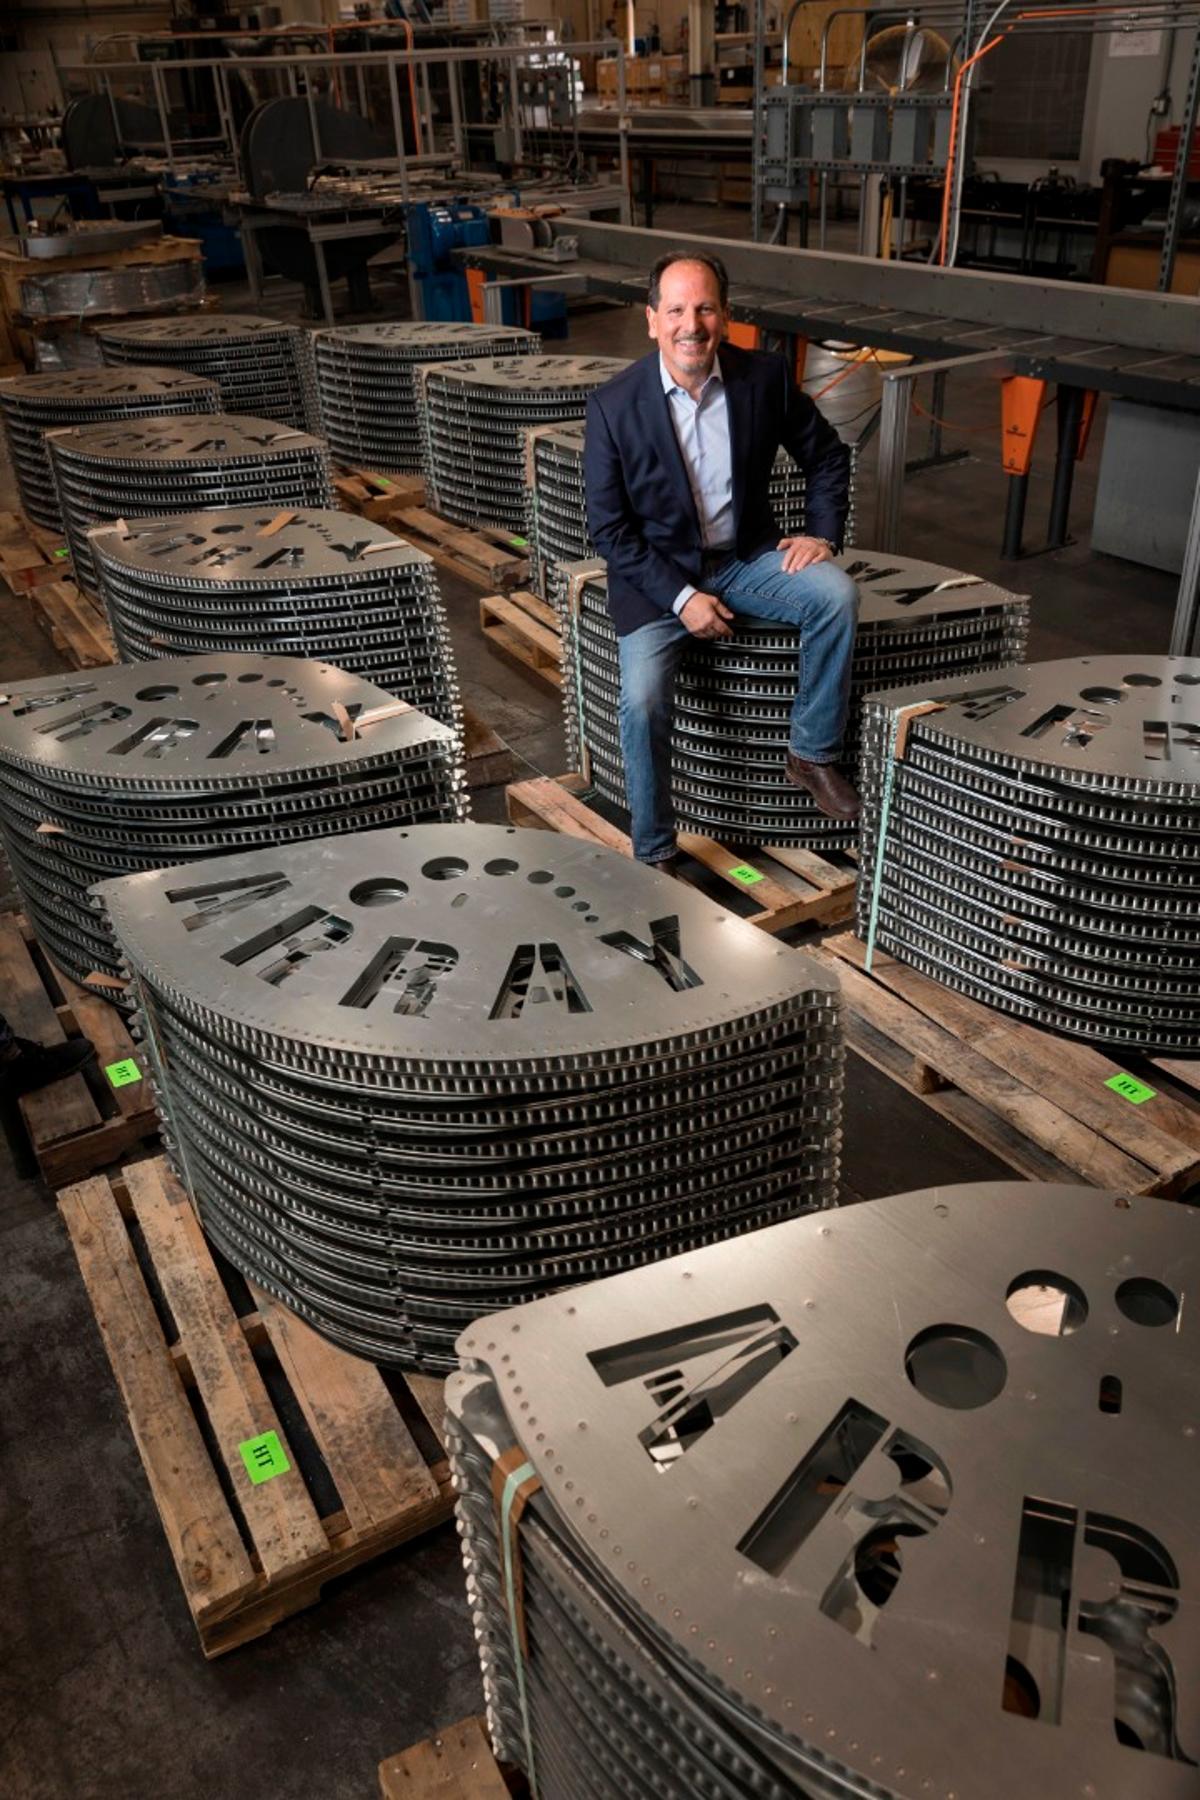 Ron Corio, CEOof Array Technologies